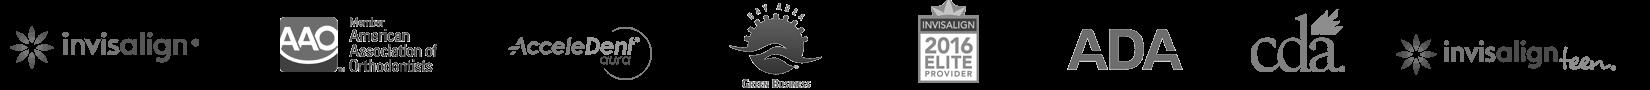 I Song Logos